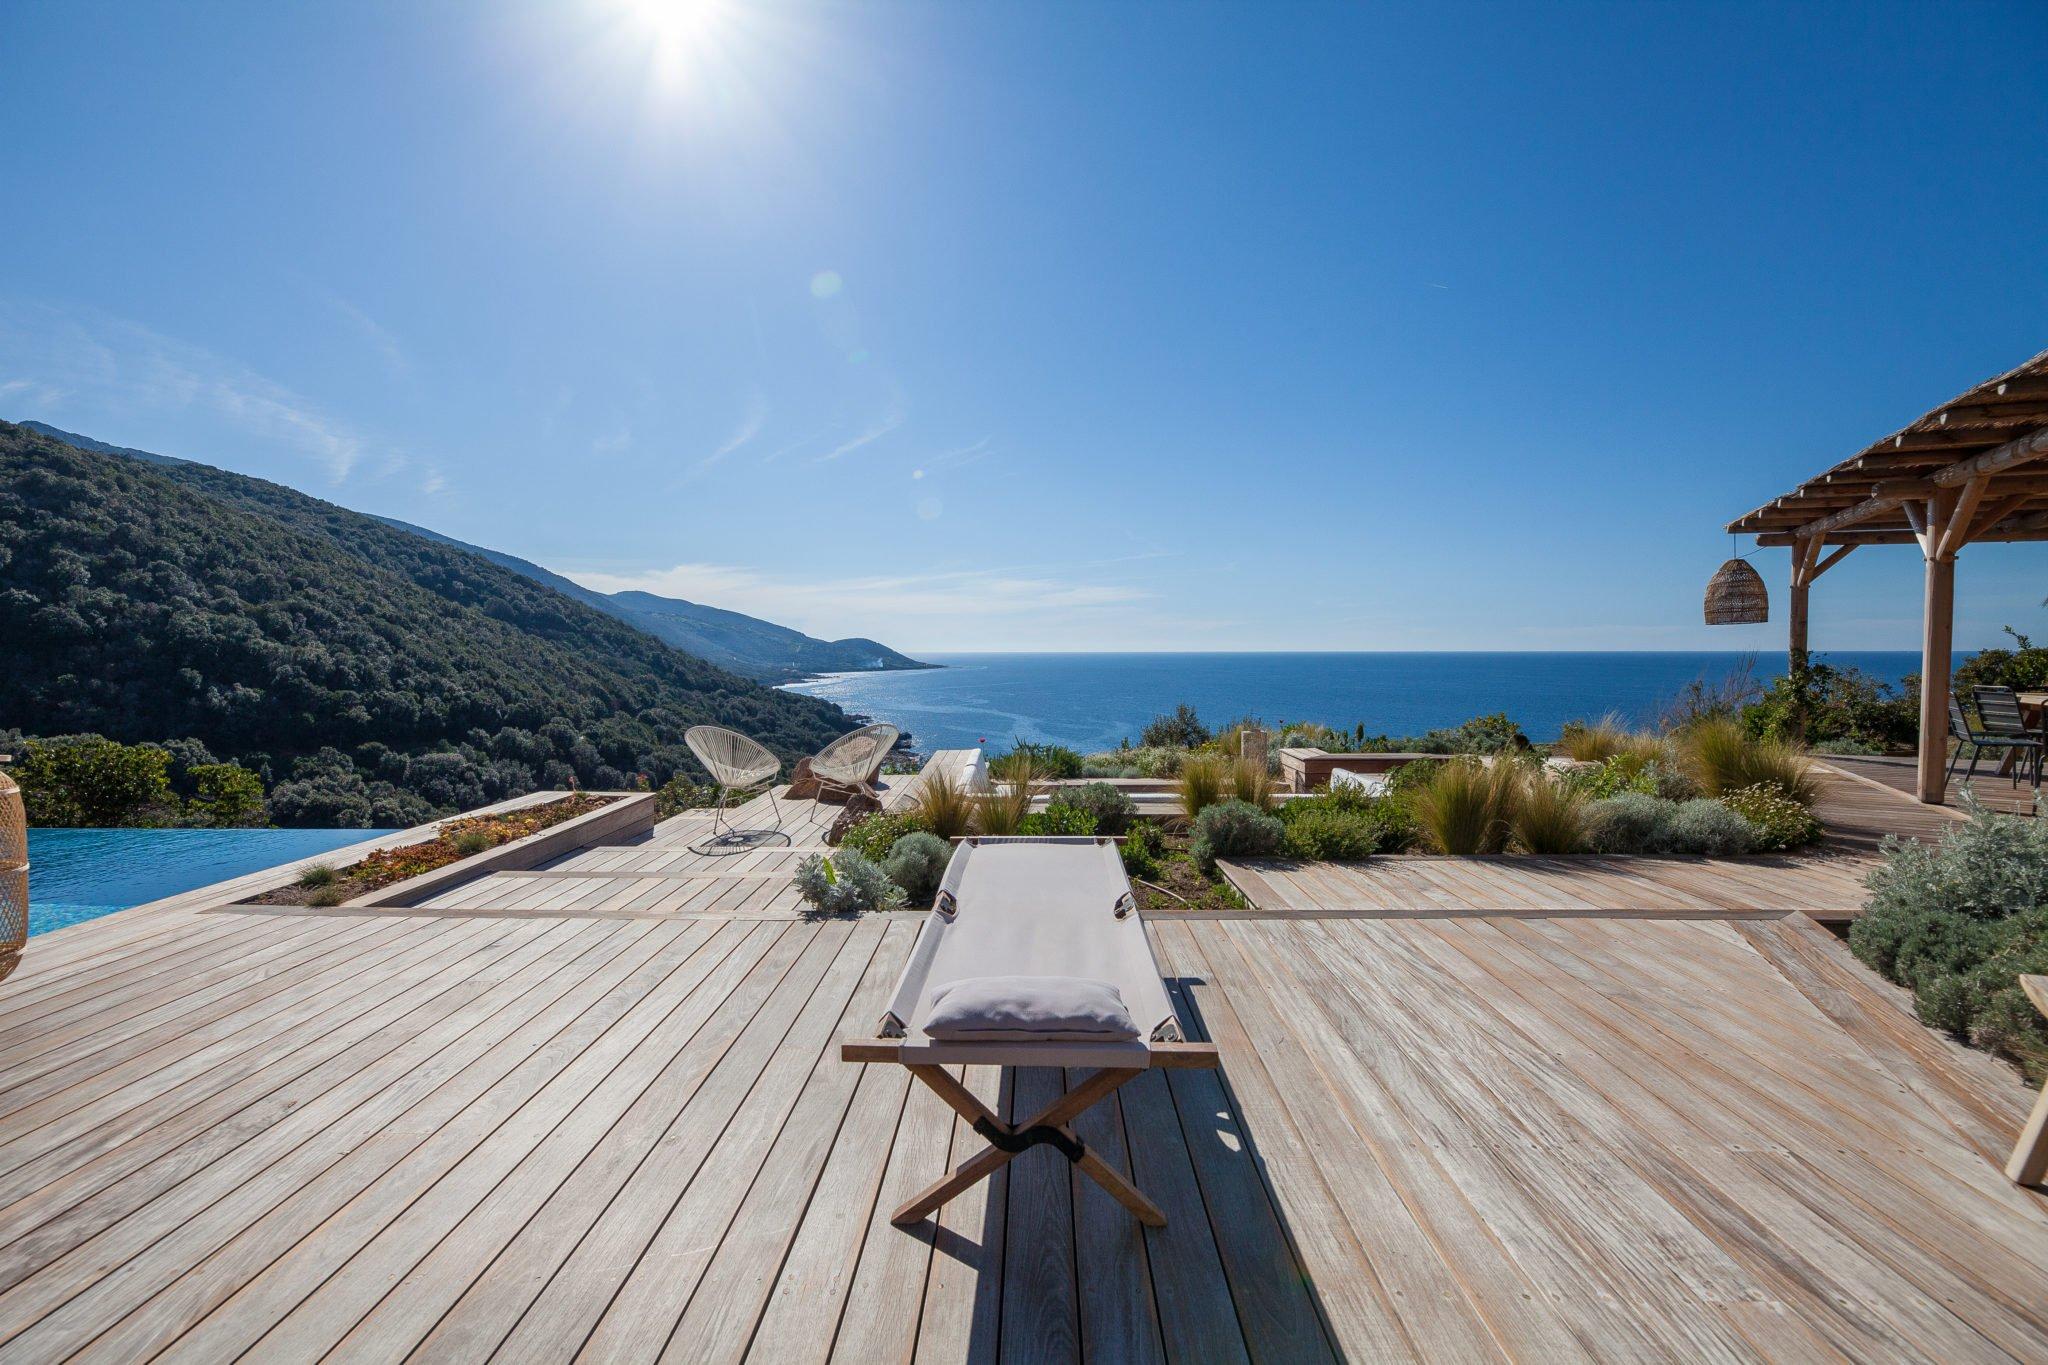 Our most beautiful rental Corsica villas